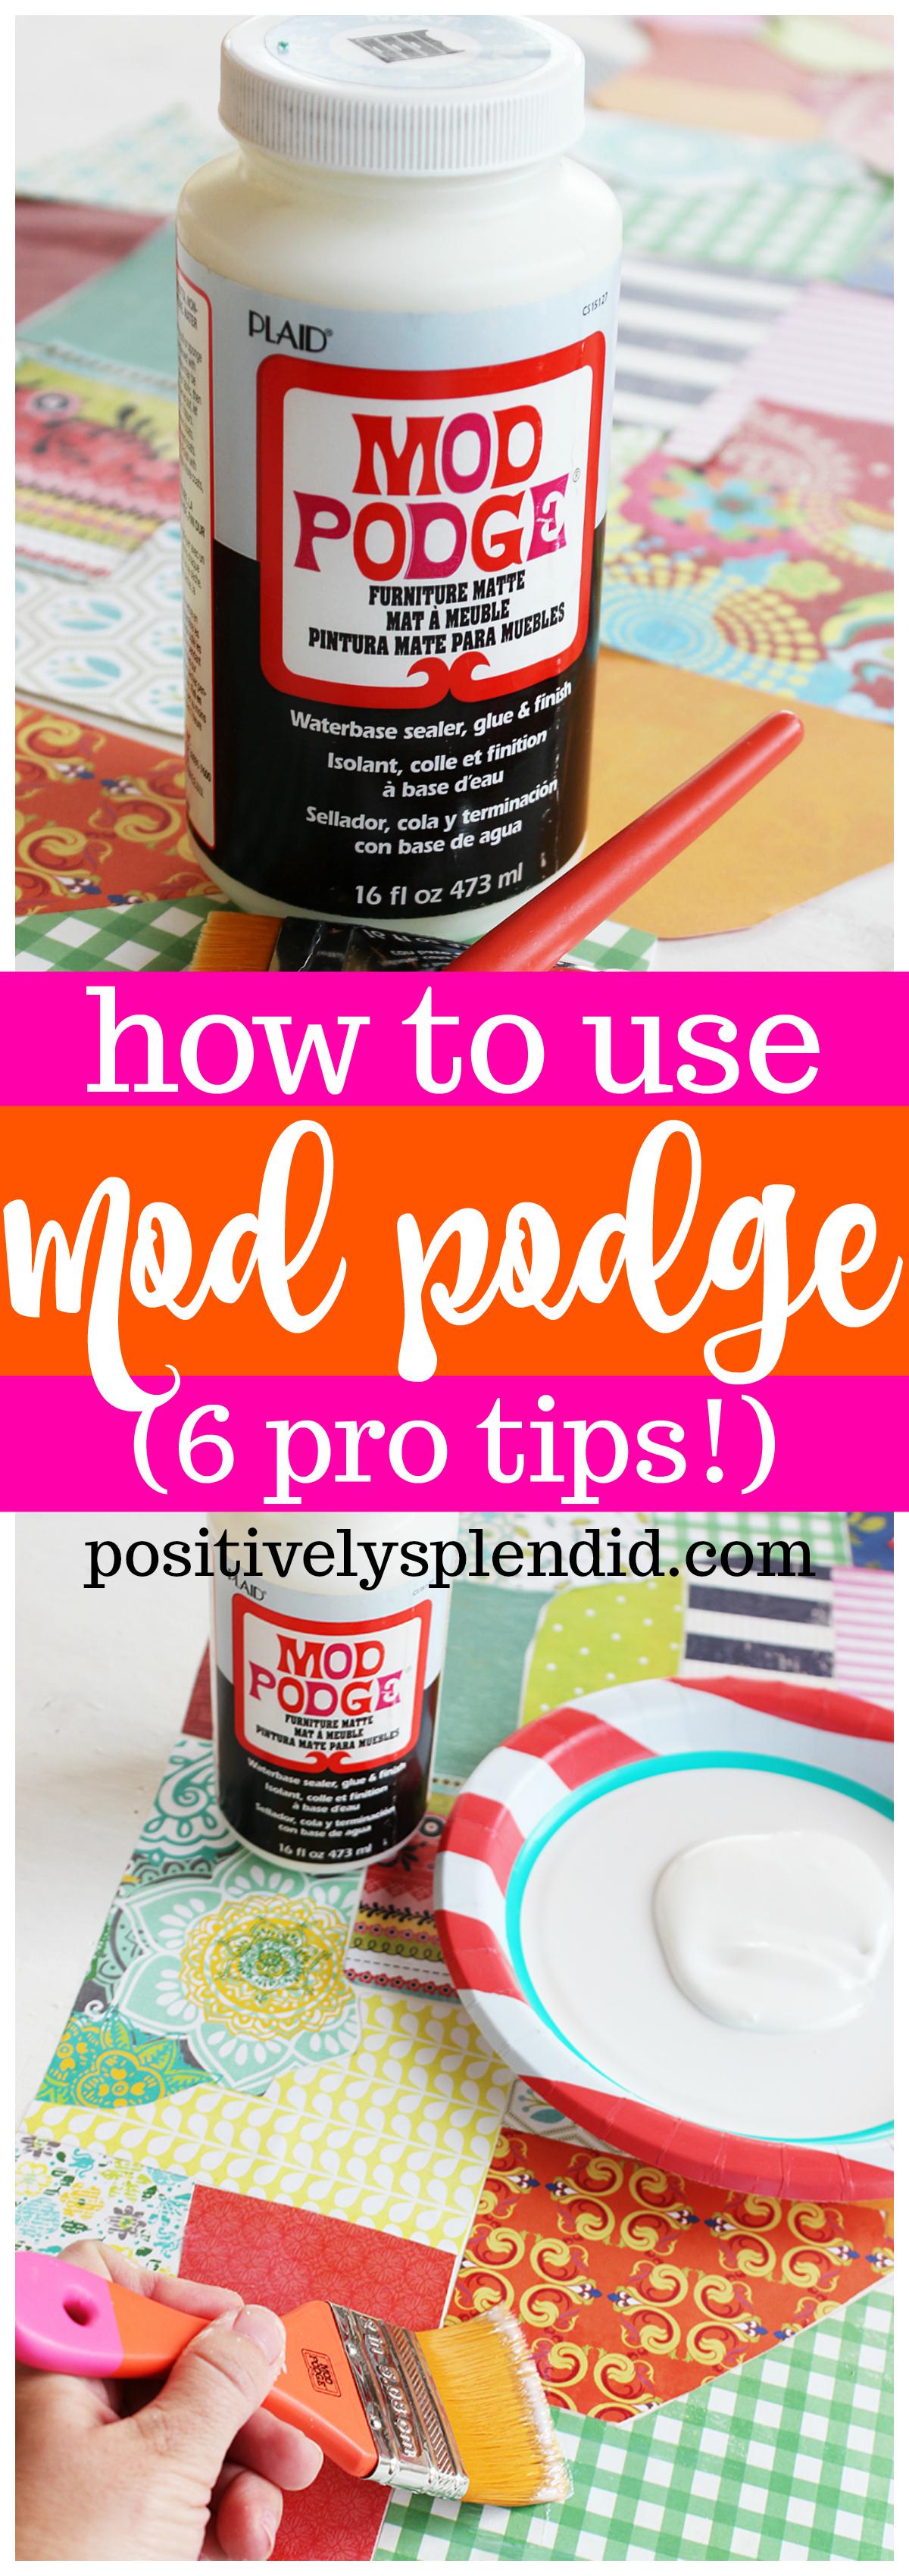 Can I Put Mod Podge Over Acrylic Paint : podge, acrylic, paint, Podge, Great, Tricks!